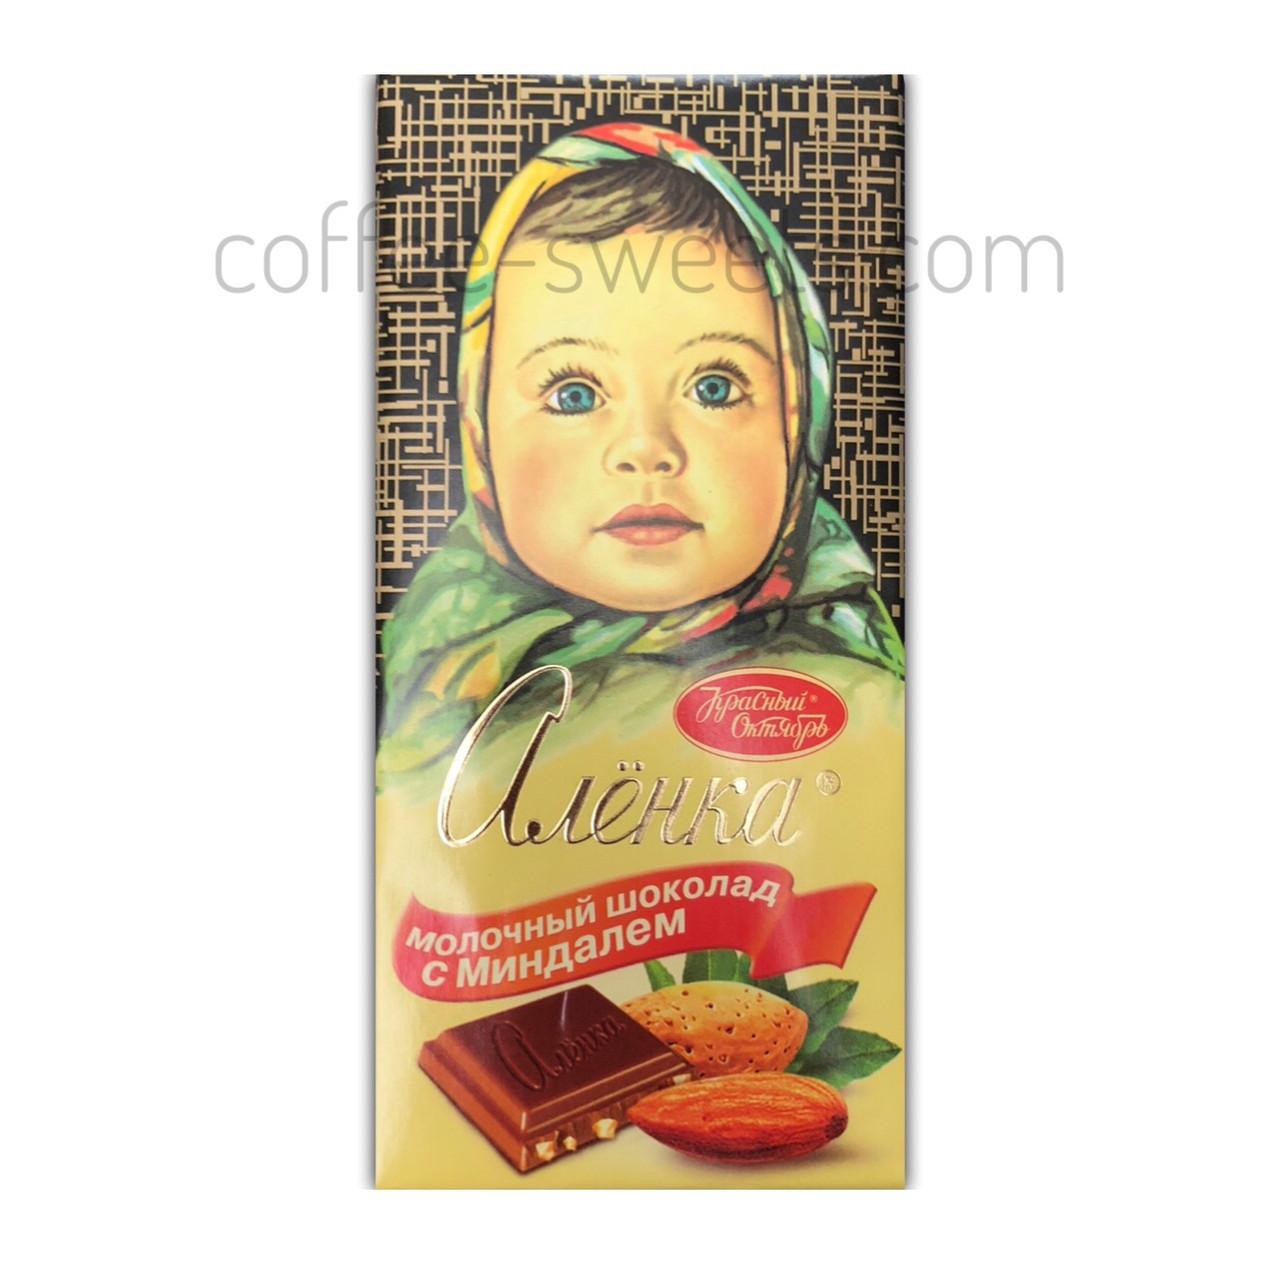 Шоколад Алёнка 100г с Миндалем молочный Красный Октябрь